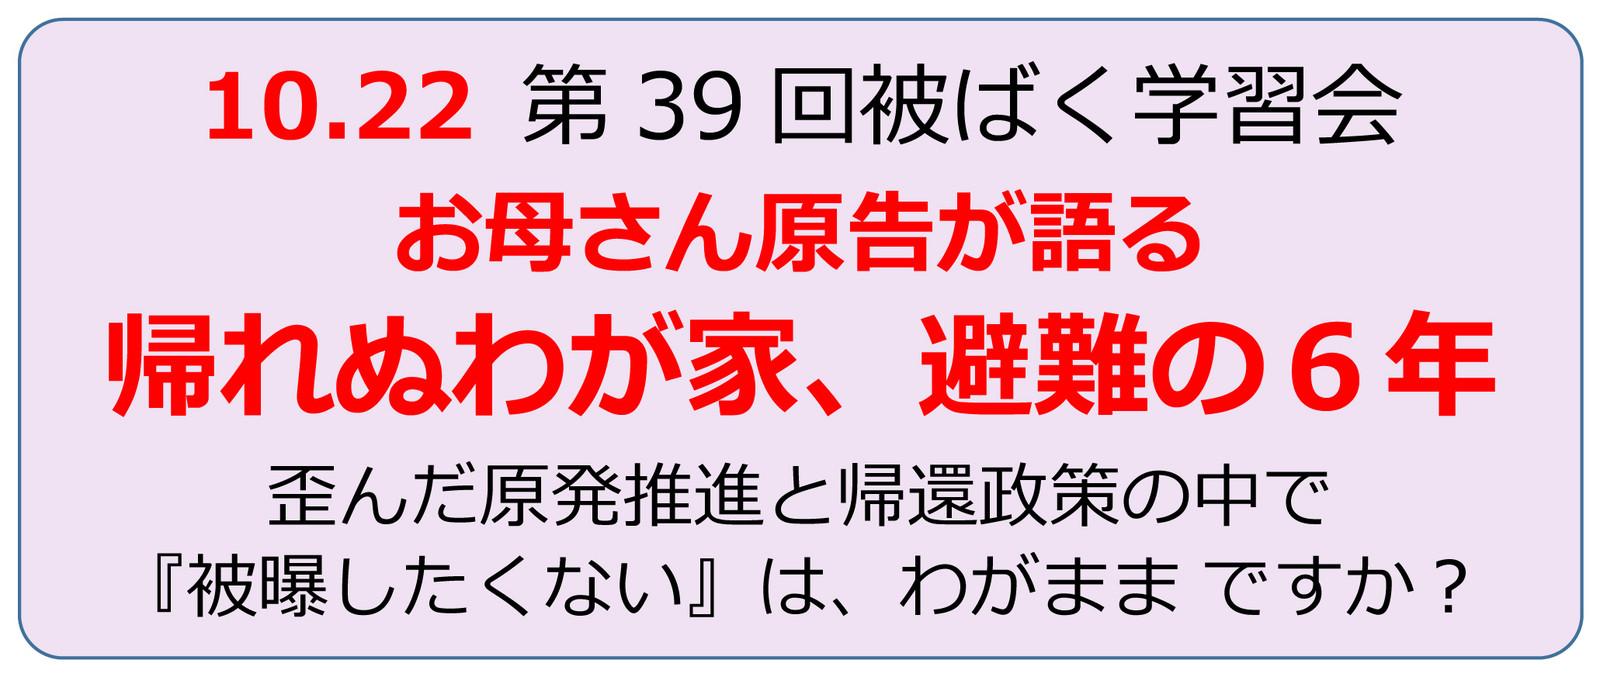 201710225v_